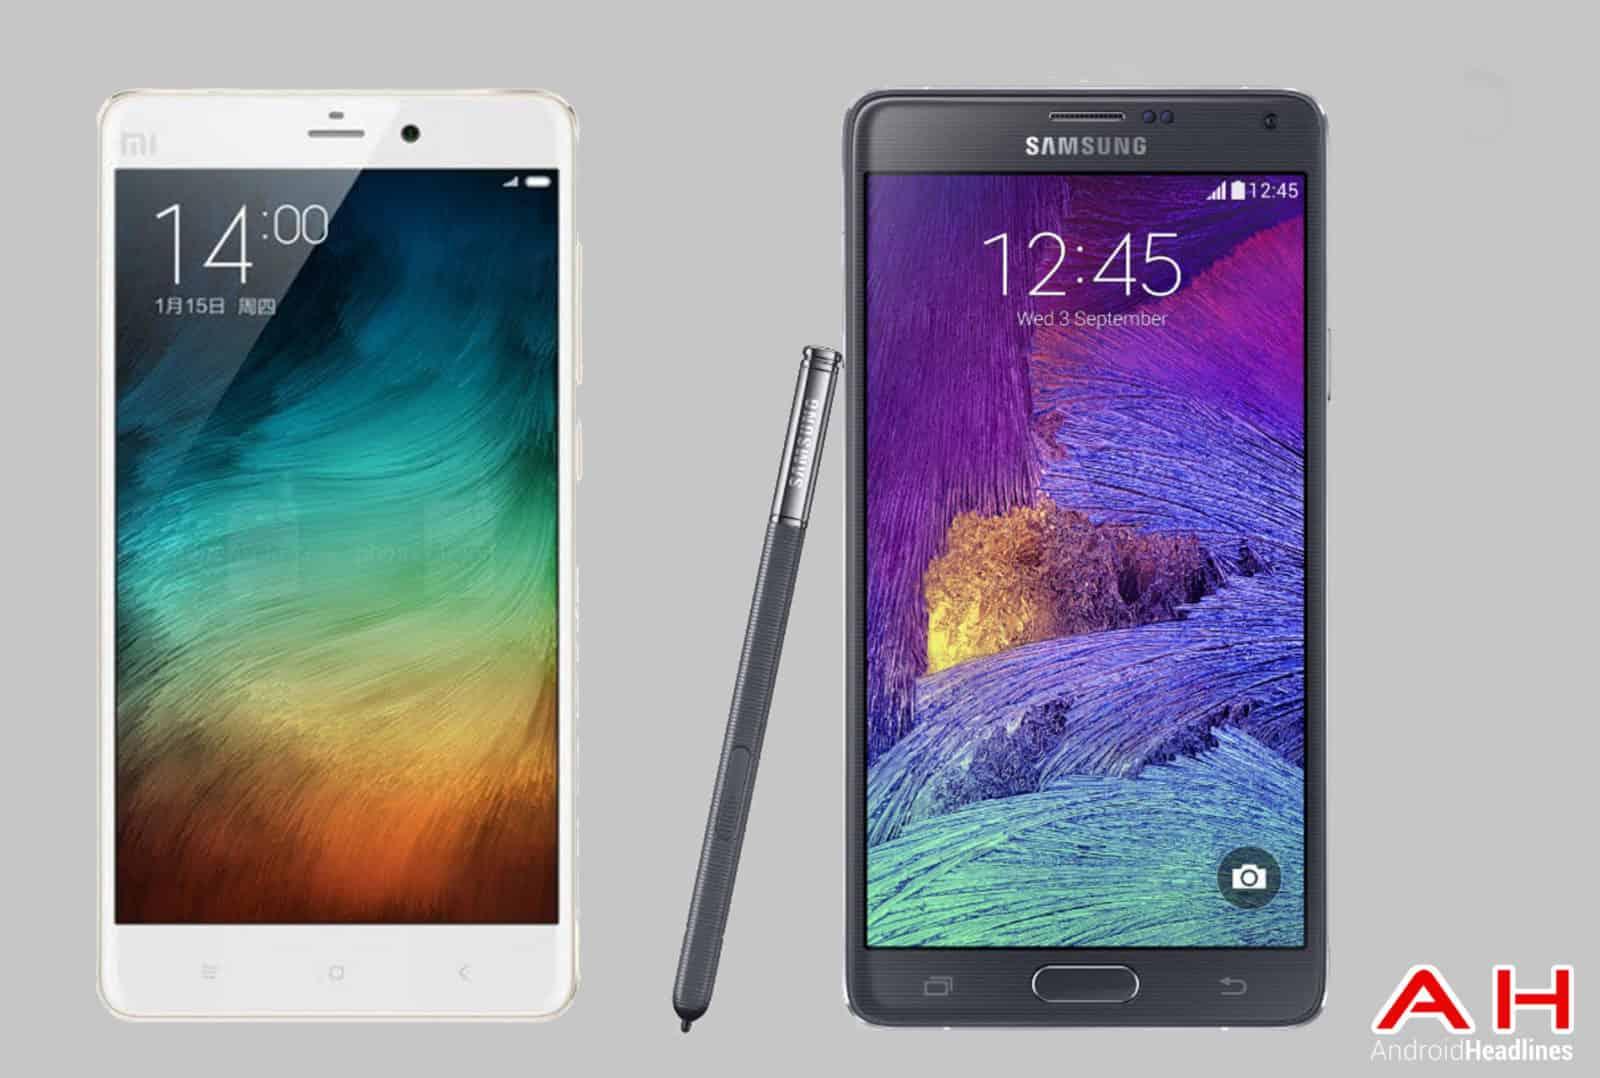 Xiaomi Mi Note Pro vs Galaxy Note 4 cam AH